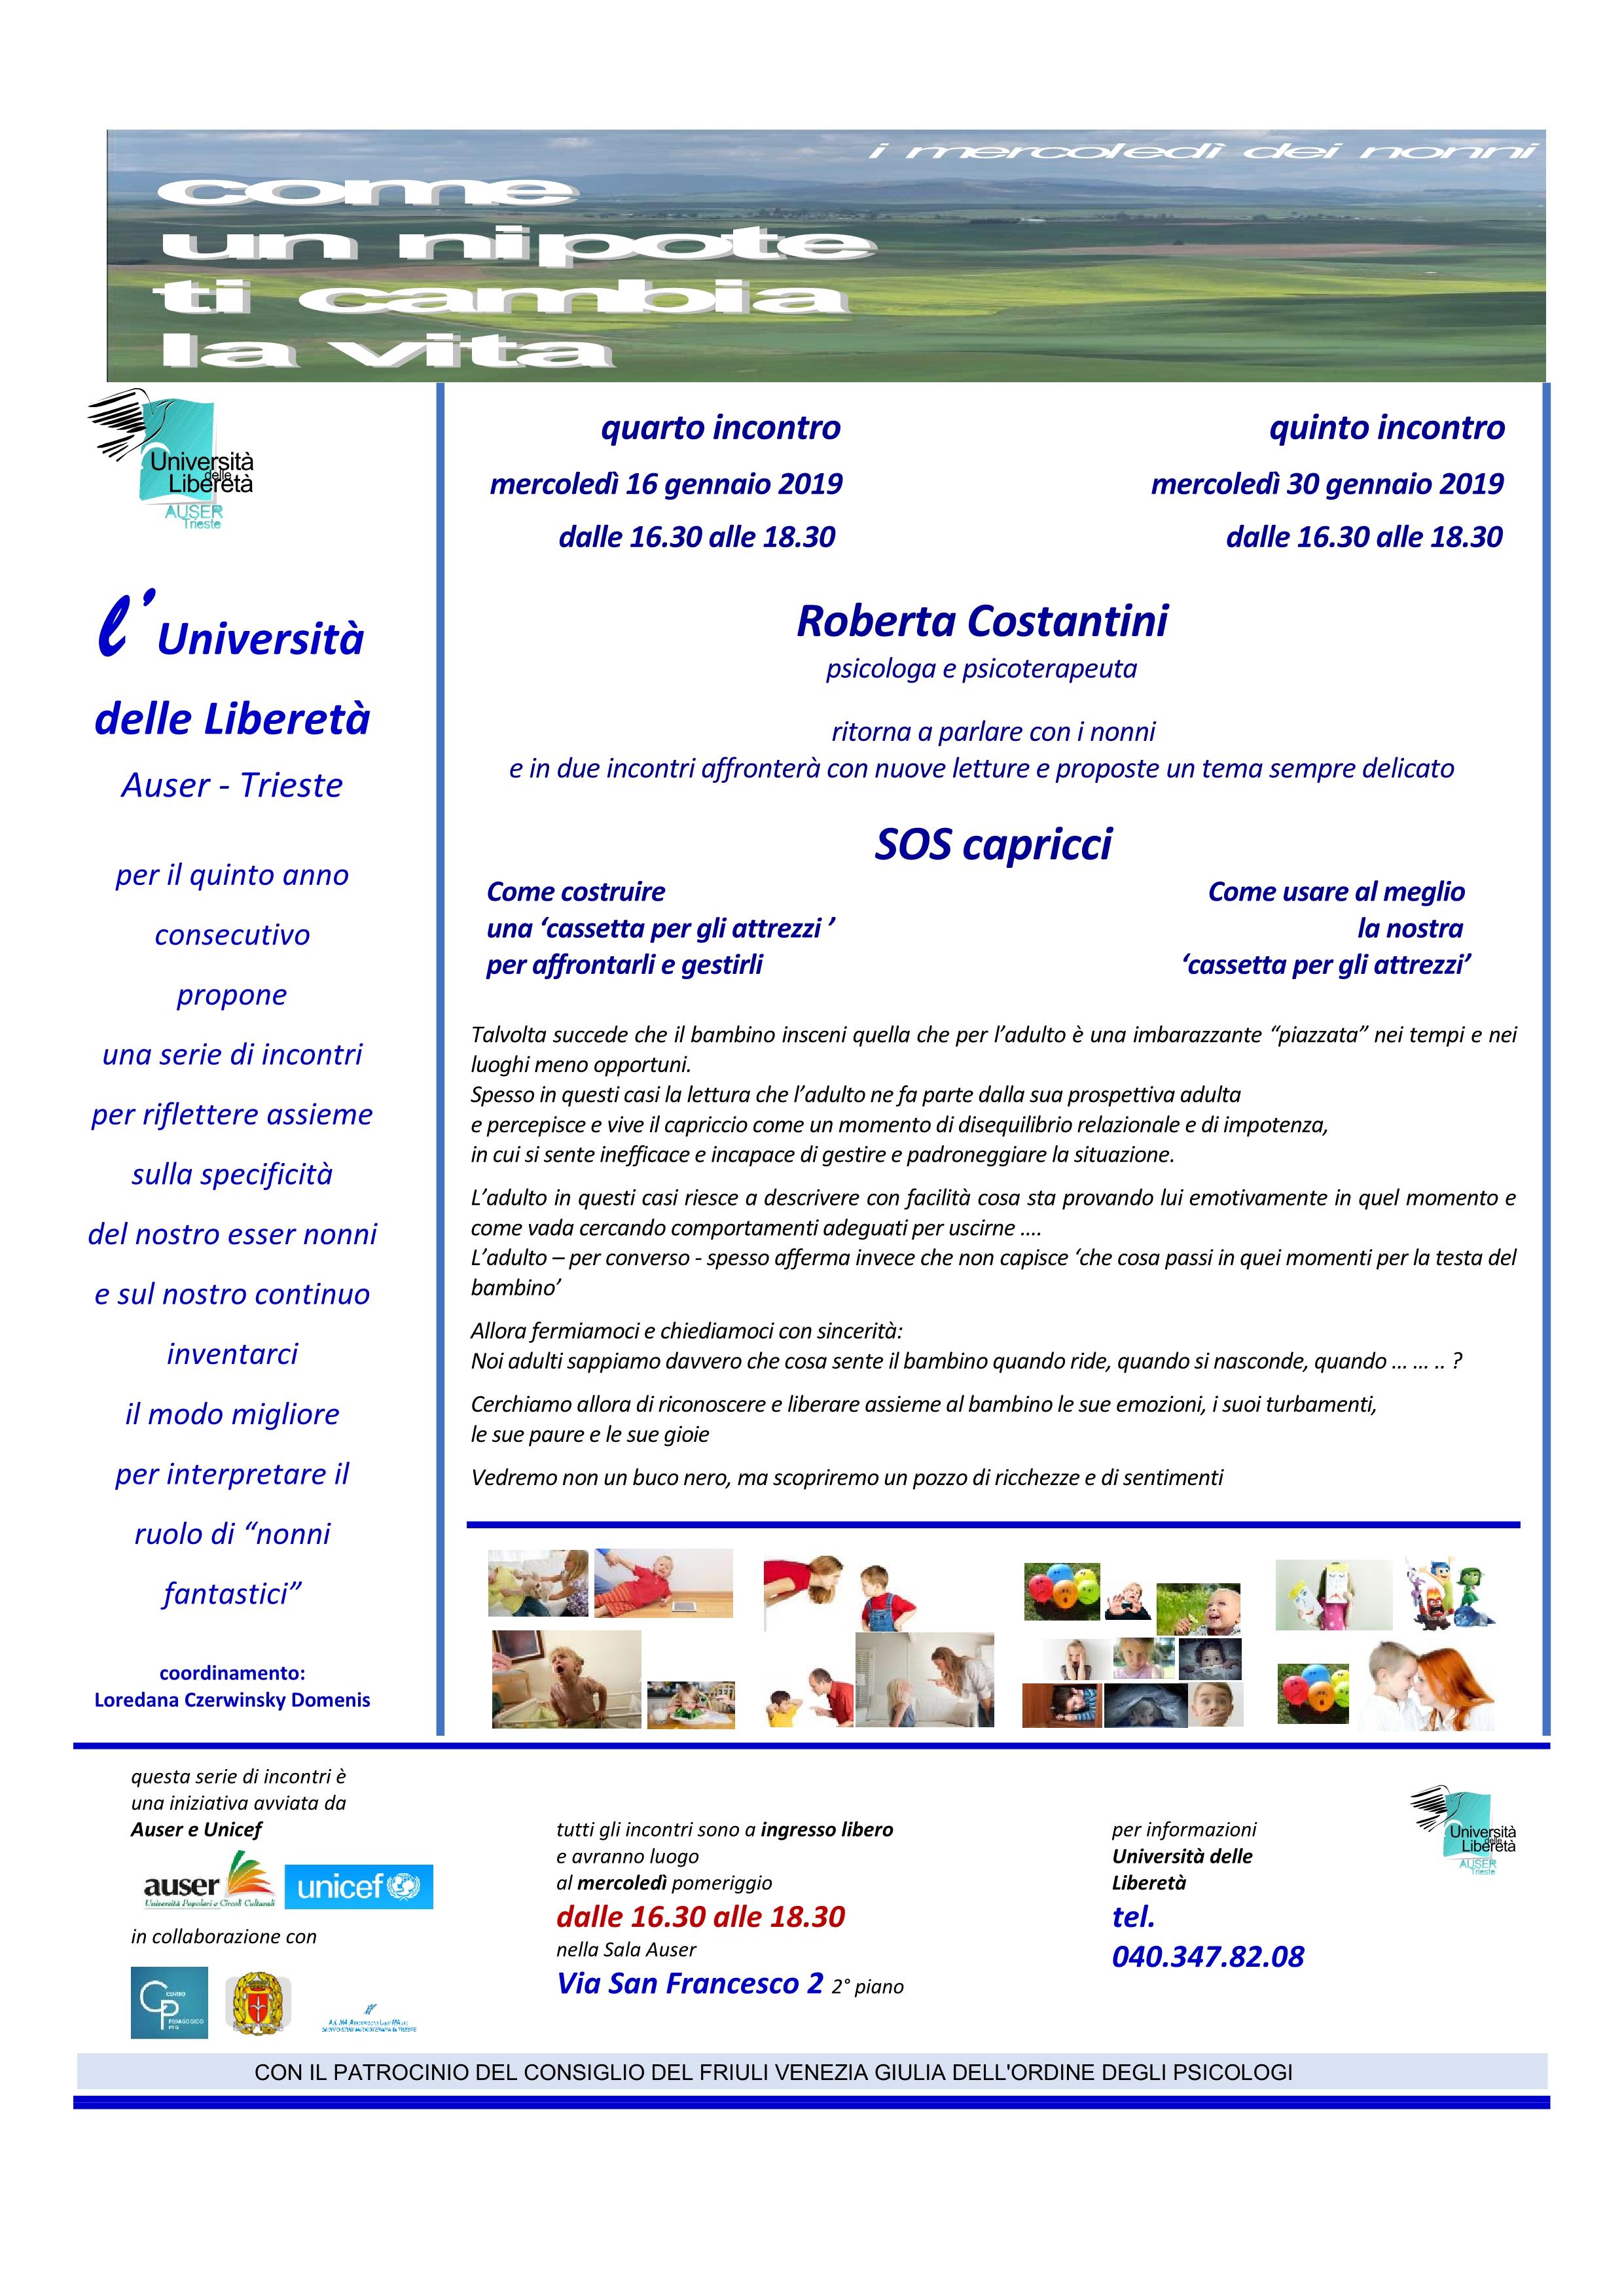 4.0-Depliant-Costantini -16-30gennaio20191